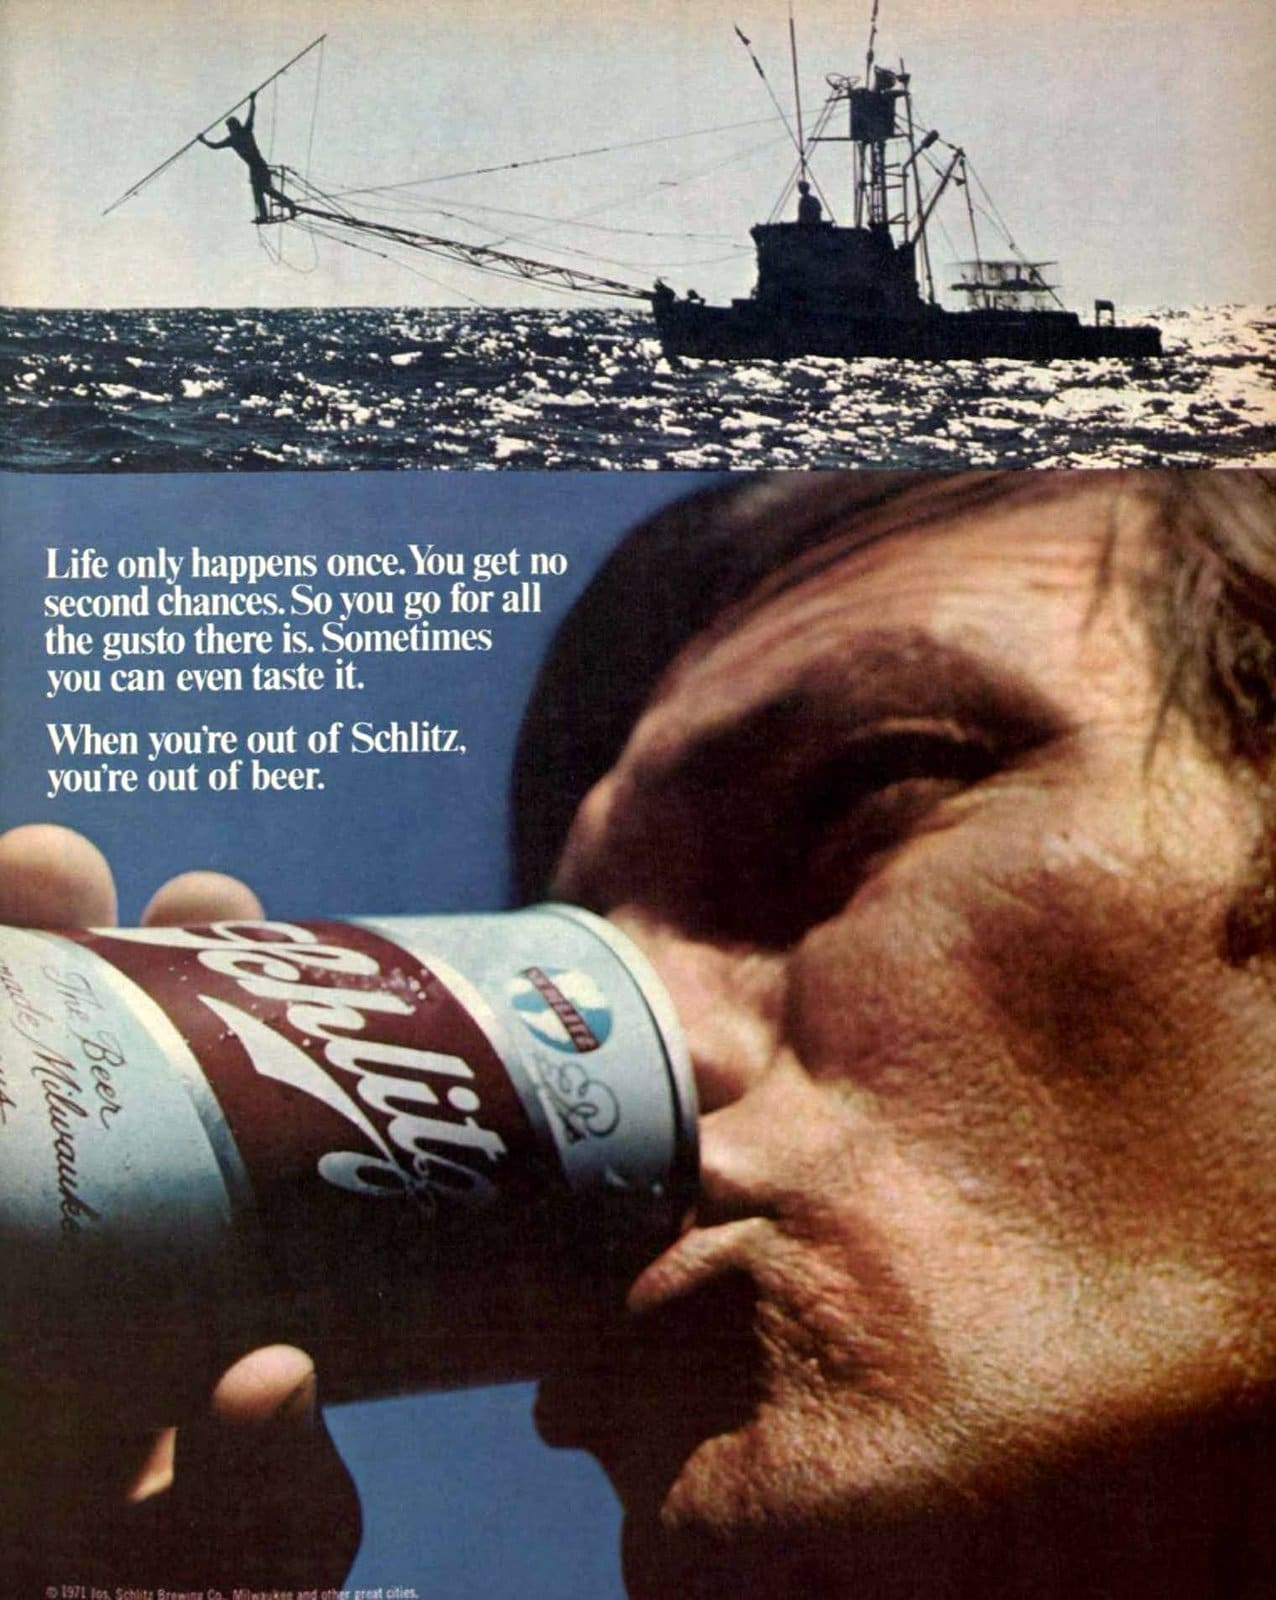 Schlitz beer - Life happens only once (1971)